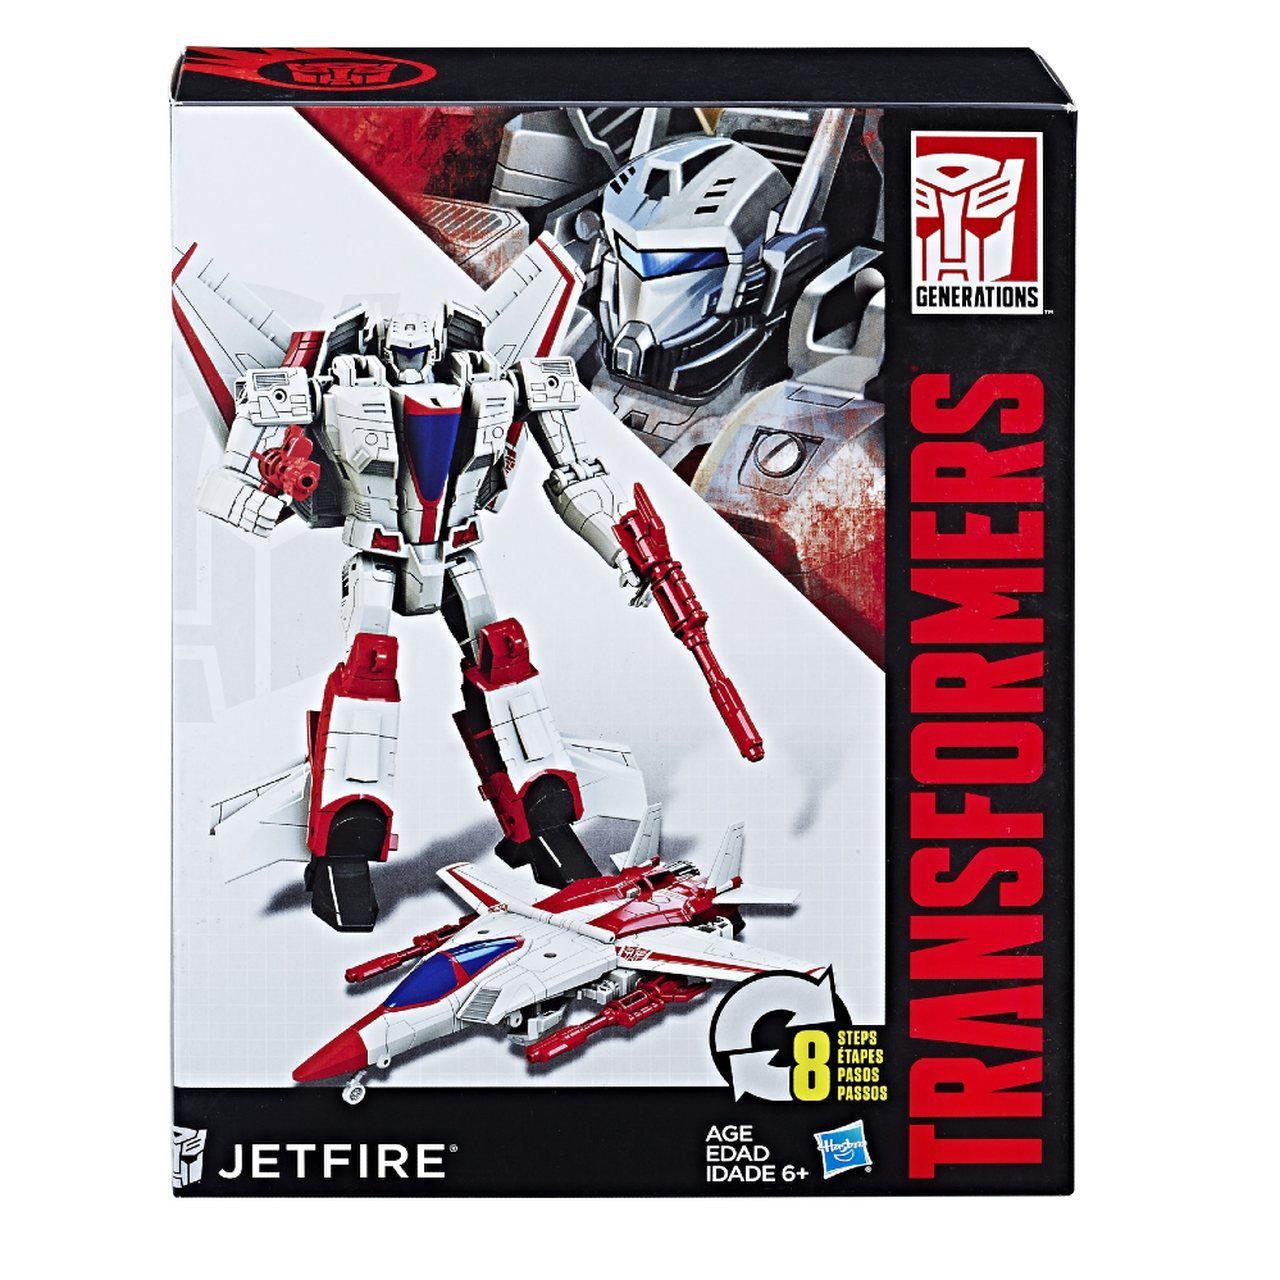 Boneco Transformers Autobot Jetfire 18cm - Hasbro B0785